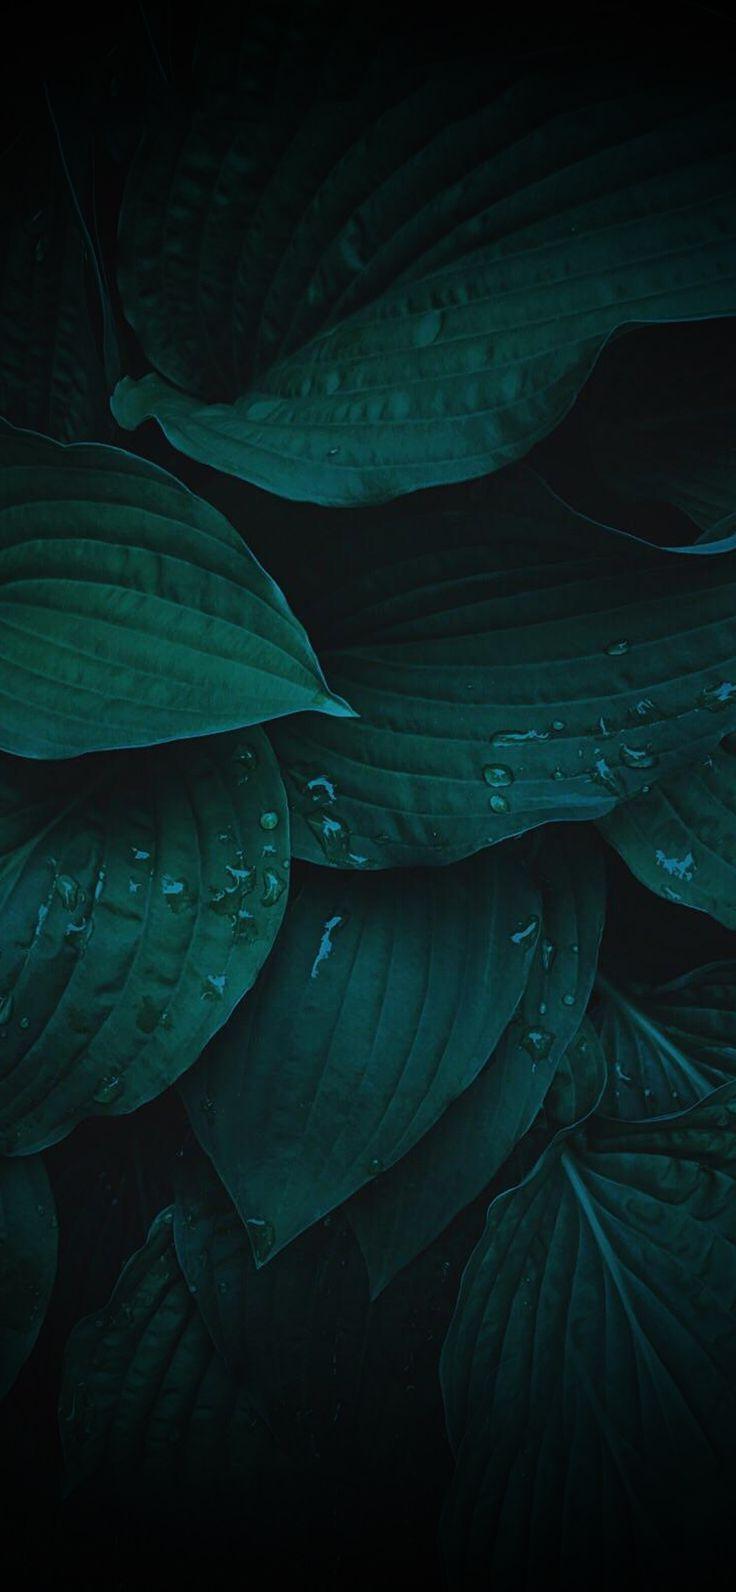 Dark Leaves Ioswall Green Wallpaper Phone Dark Background Wallpaper Dark Green Wallpaper